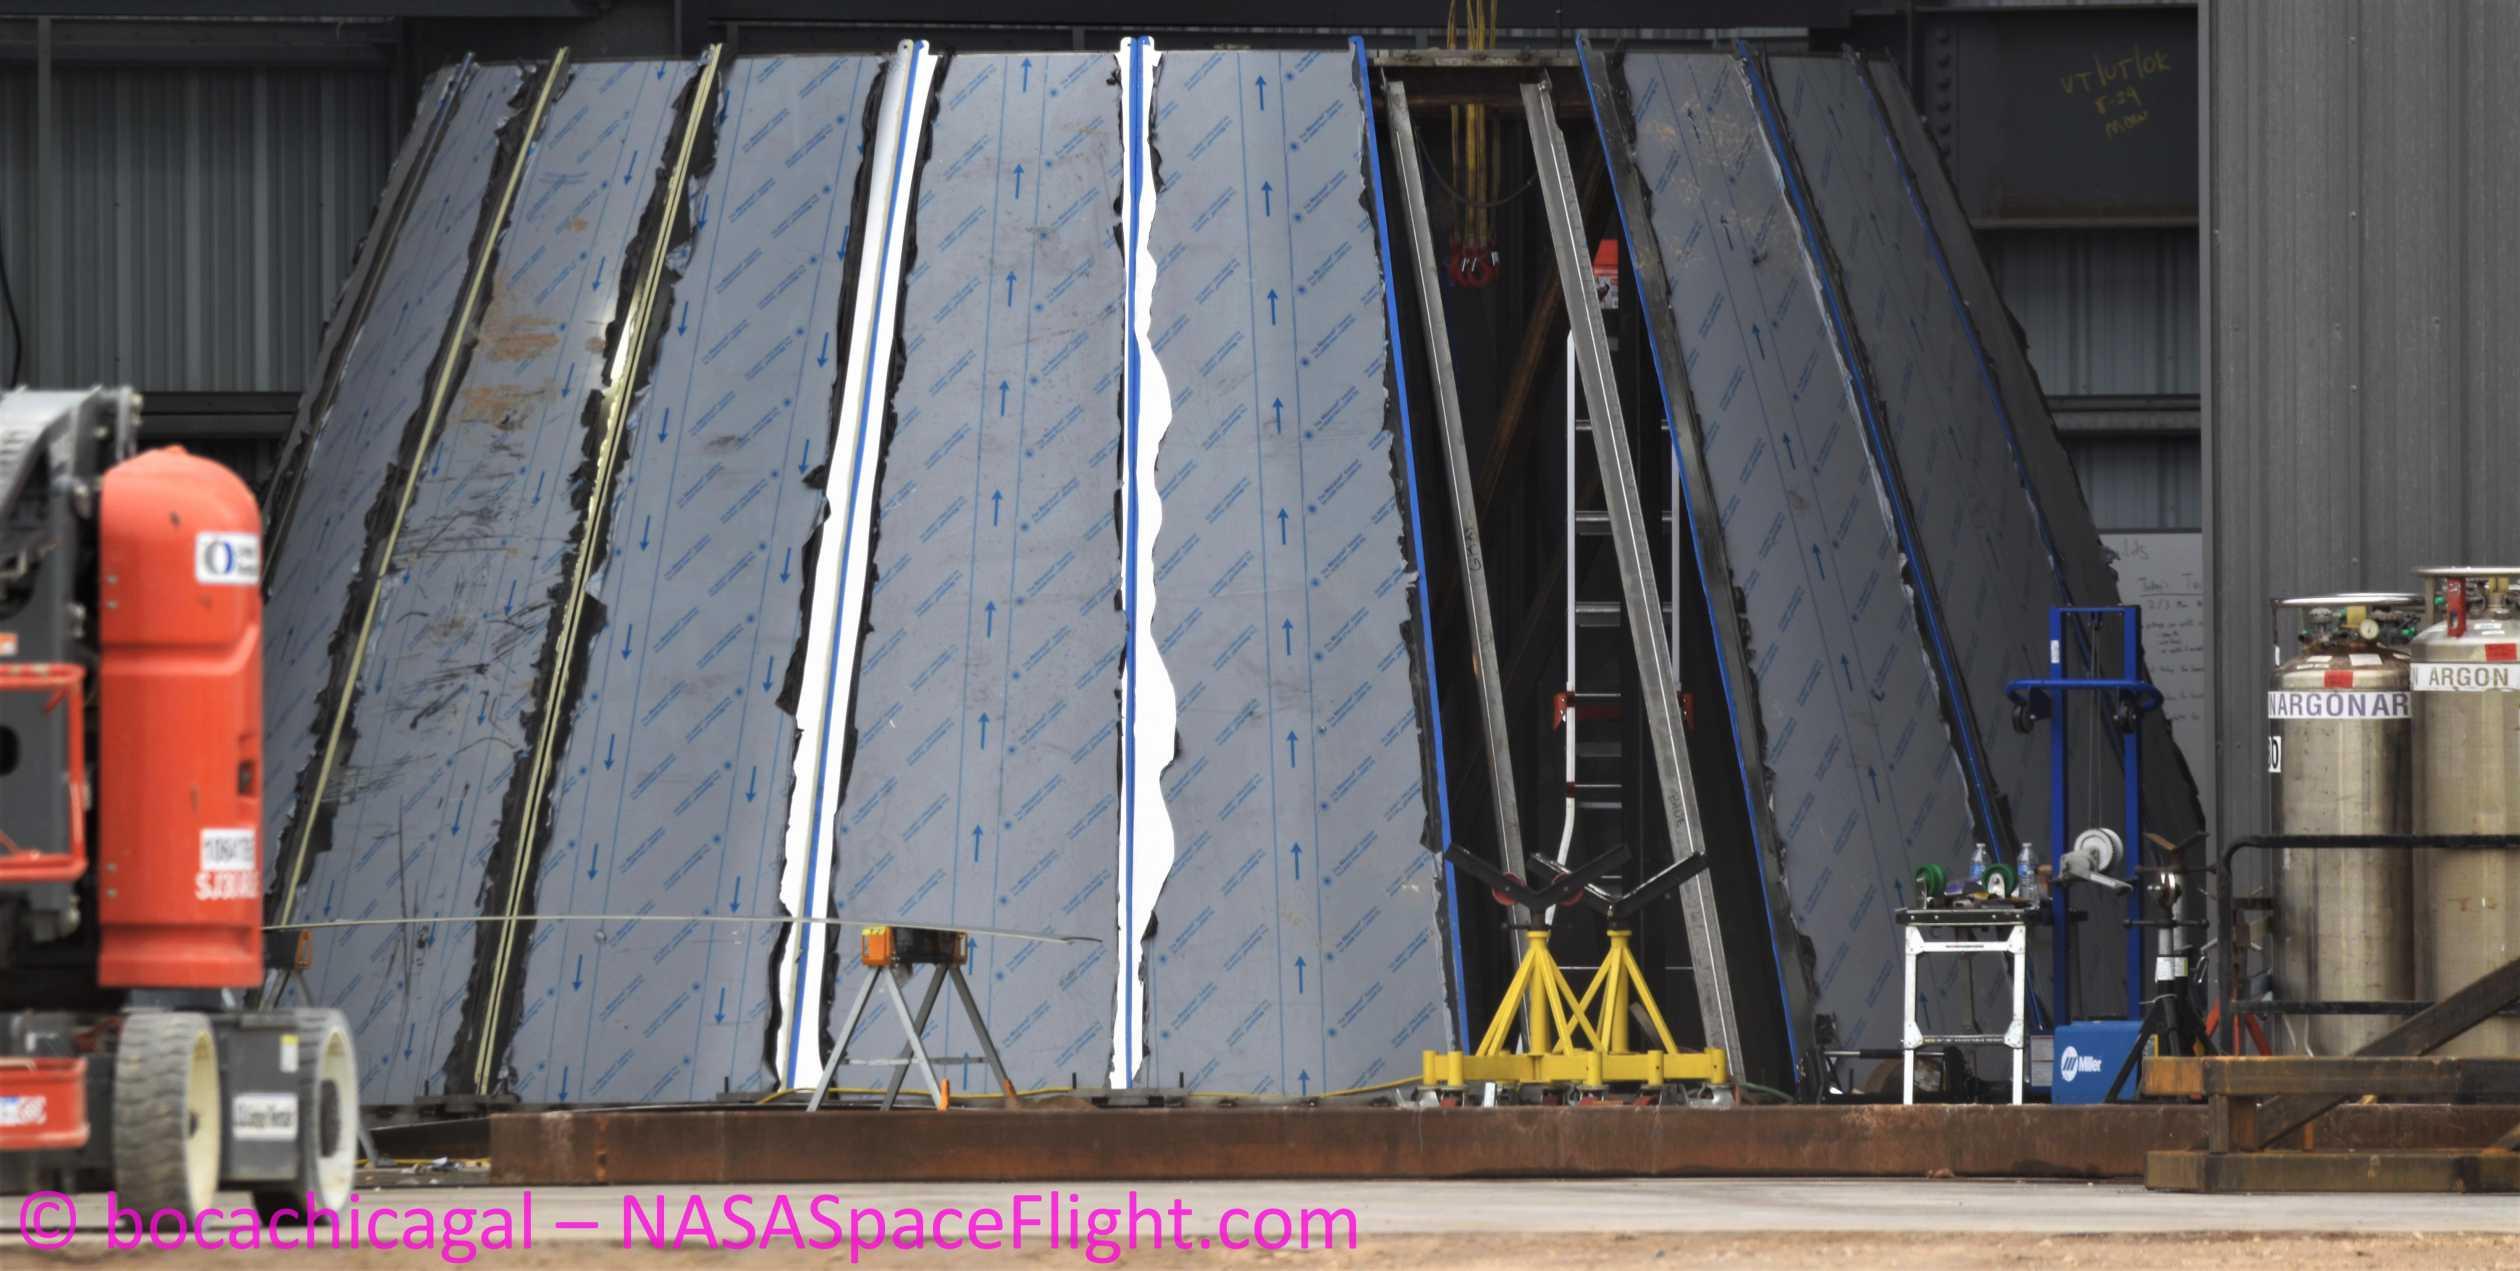 Starship Boca Chica 020420 (NASASpaceflight – bocachicagal) SN01 nose work 1 (c)